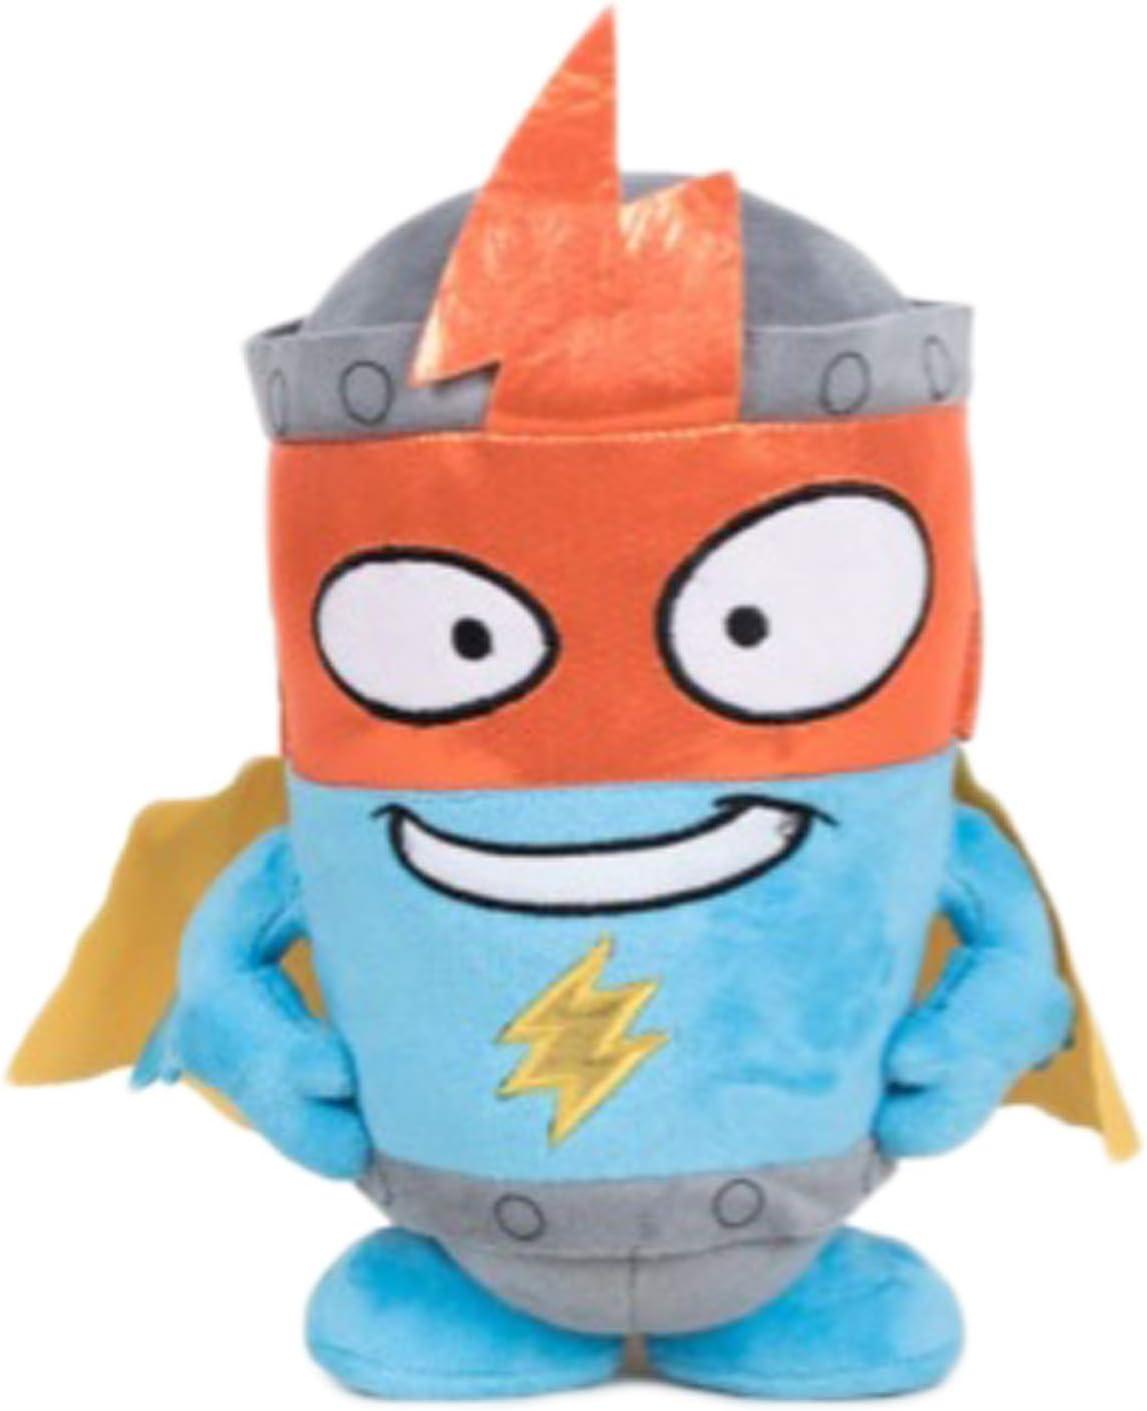 SuperZings - Peluches Calidad Super Soft (19cm, Kid Kazoom): Amazon.es: Juguetes y juegos